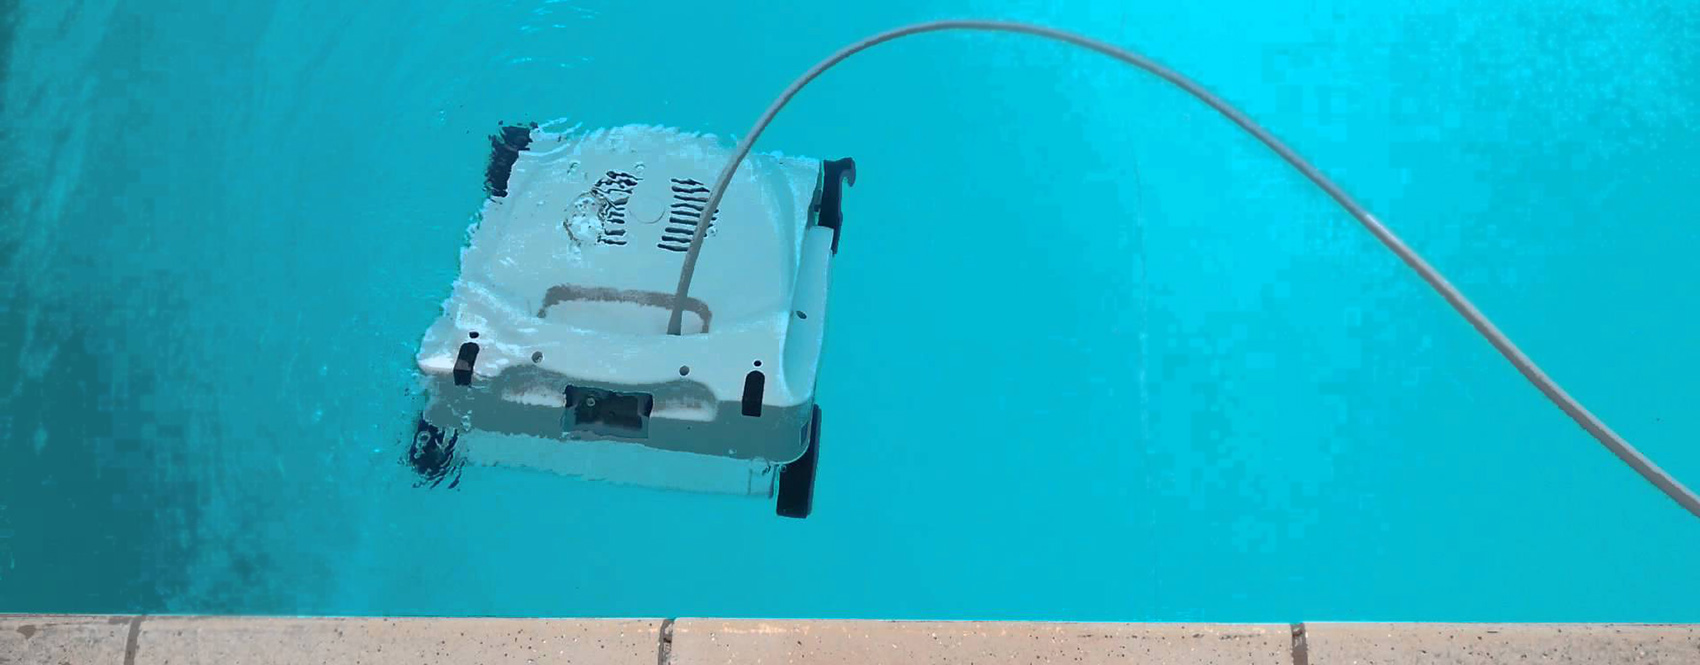 Entretien maintenance piscine vend e chauffage installation 85 for Piscine entretien